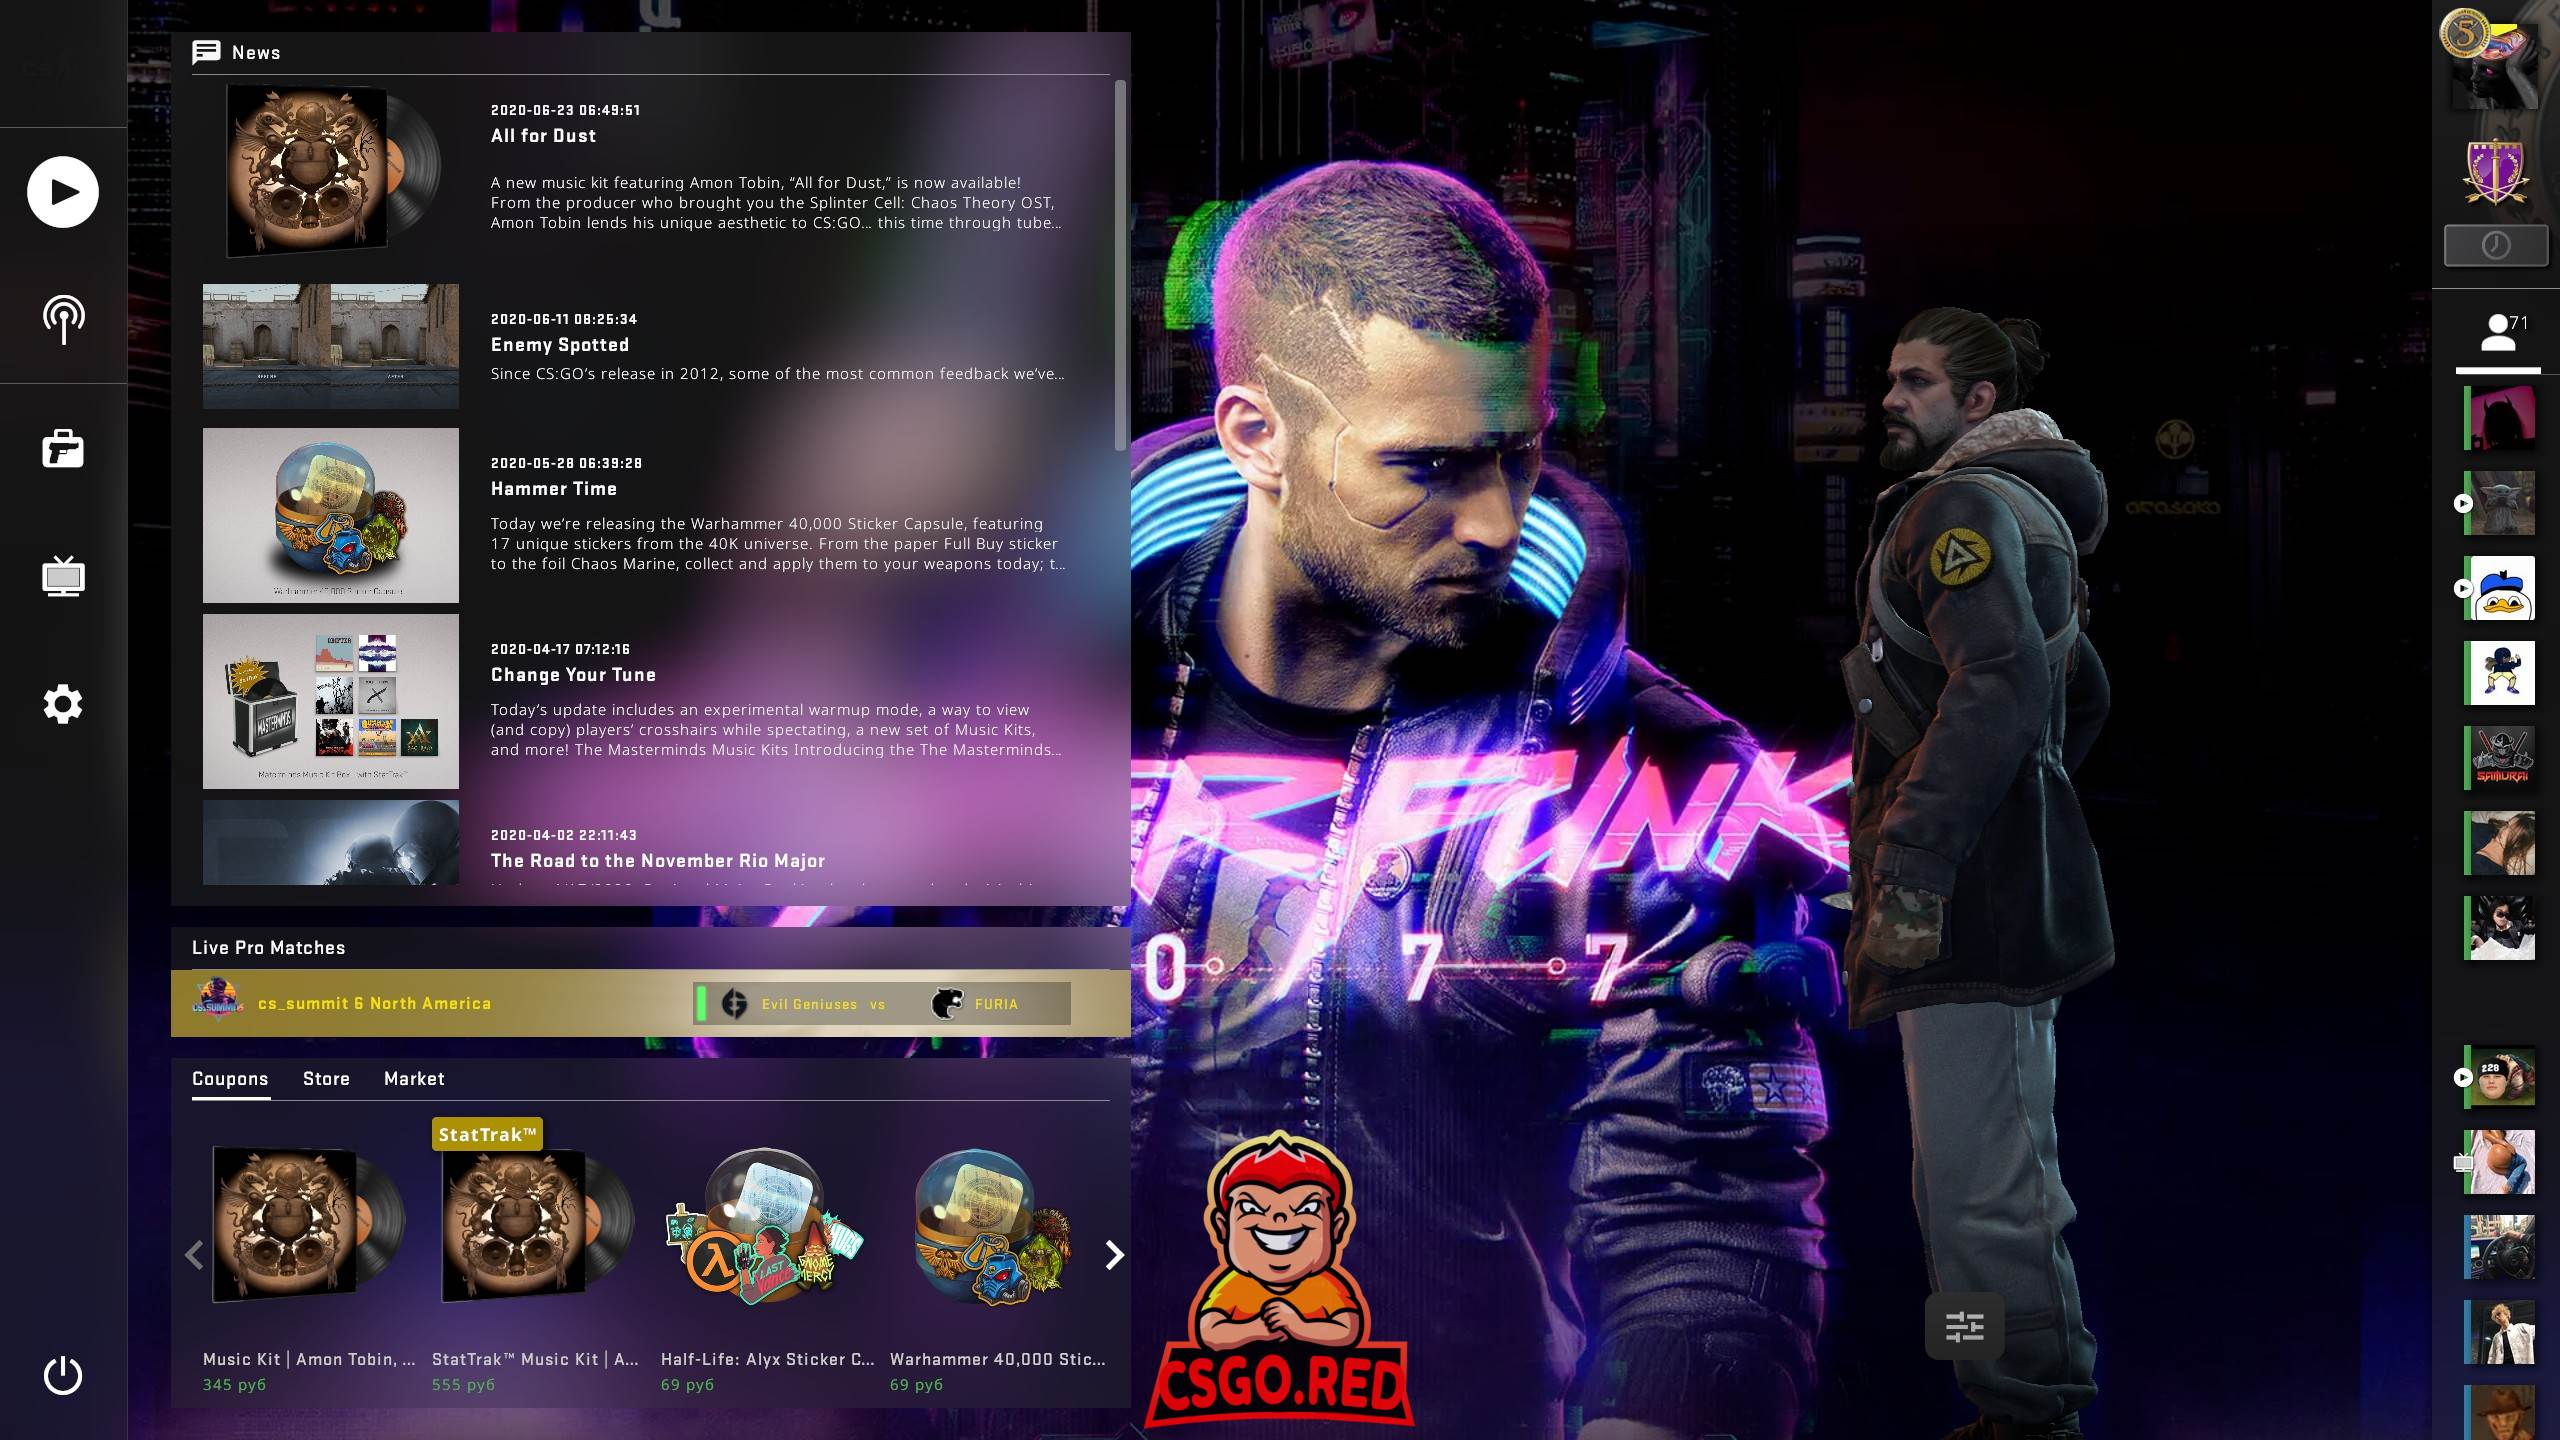 Cyberpunk 2077 protagonist panorama ui background